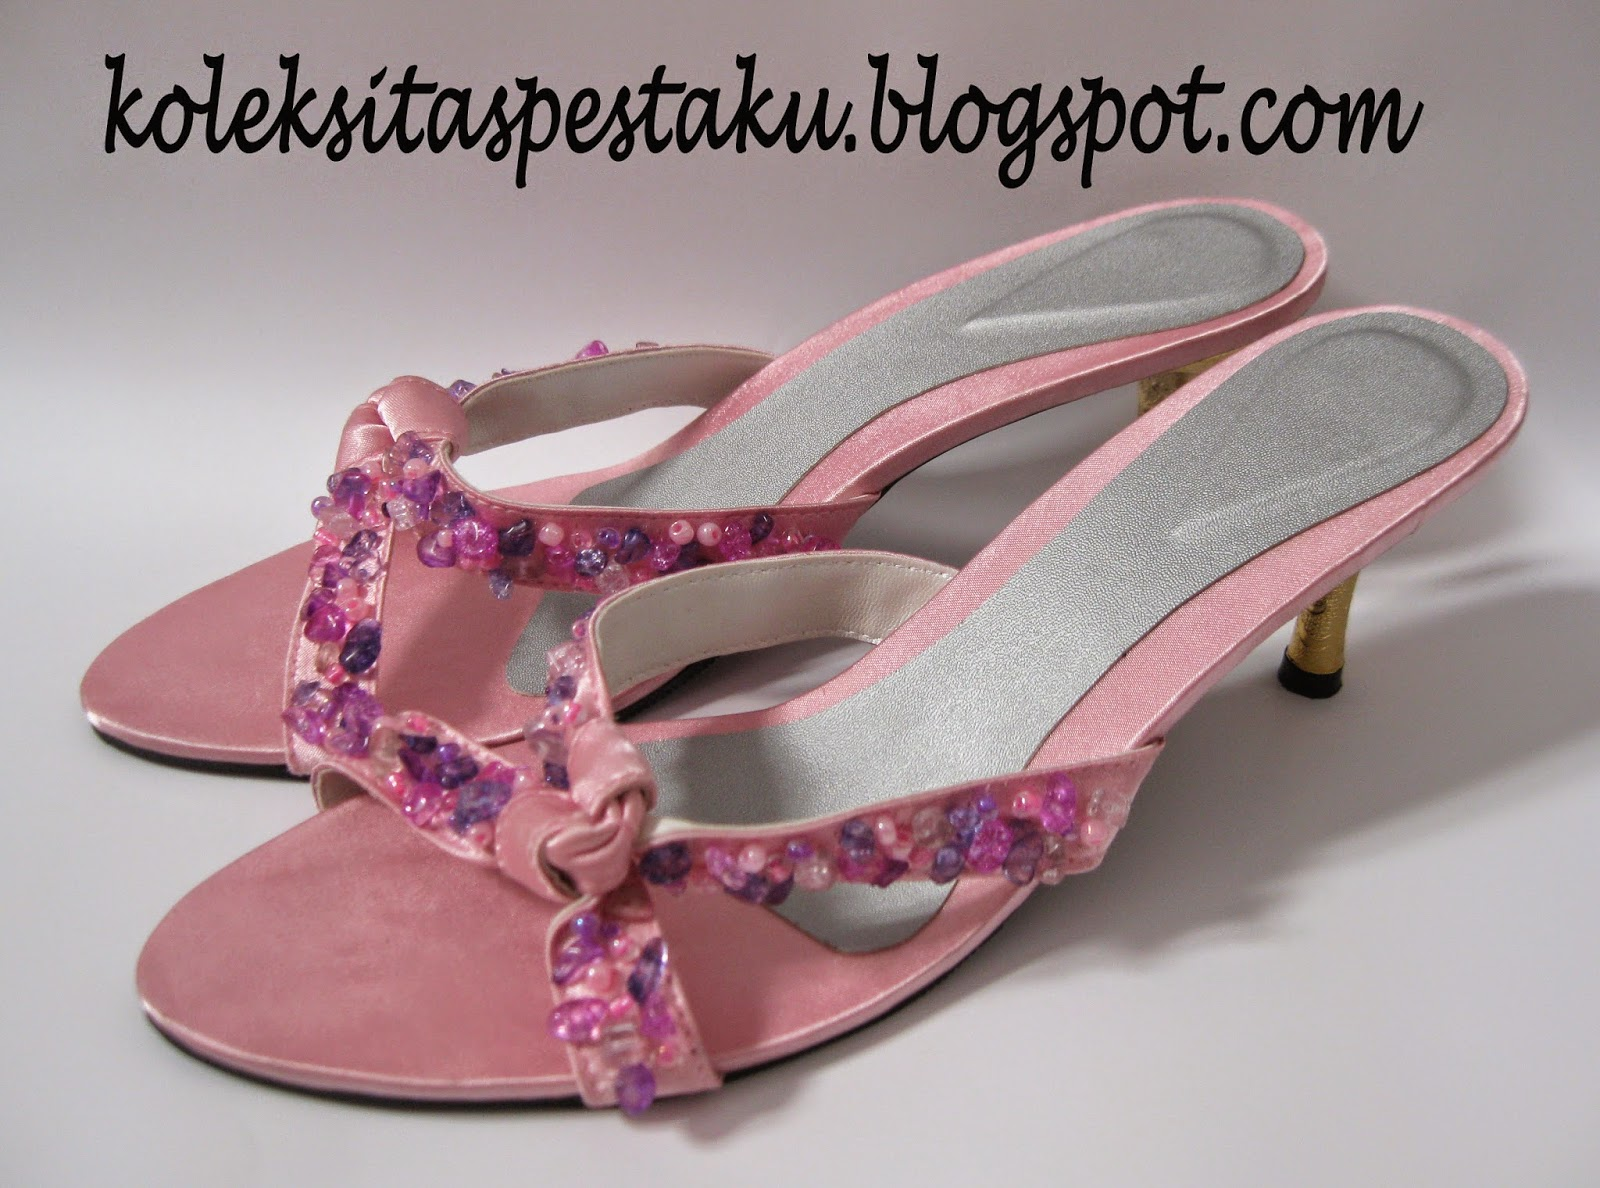 Sandal Pesta Model Terbaru Koleksi Tas Pesta Ku Cantik